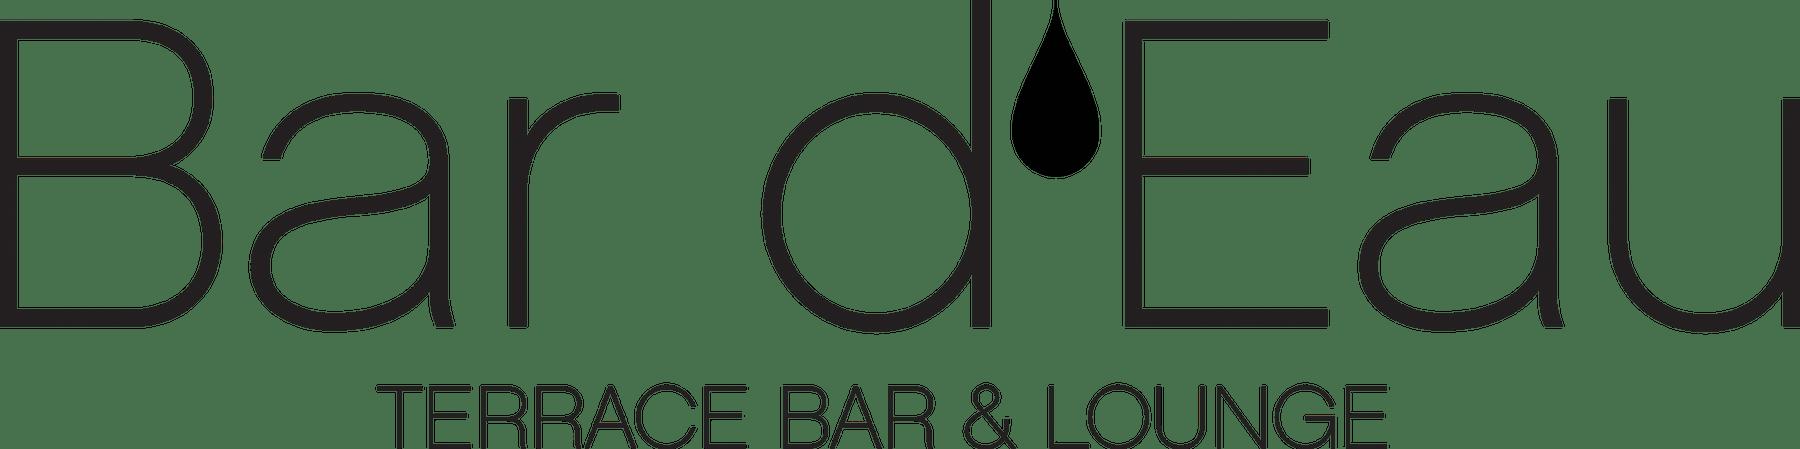 Bar d'Eau